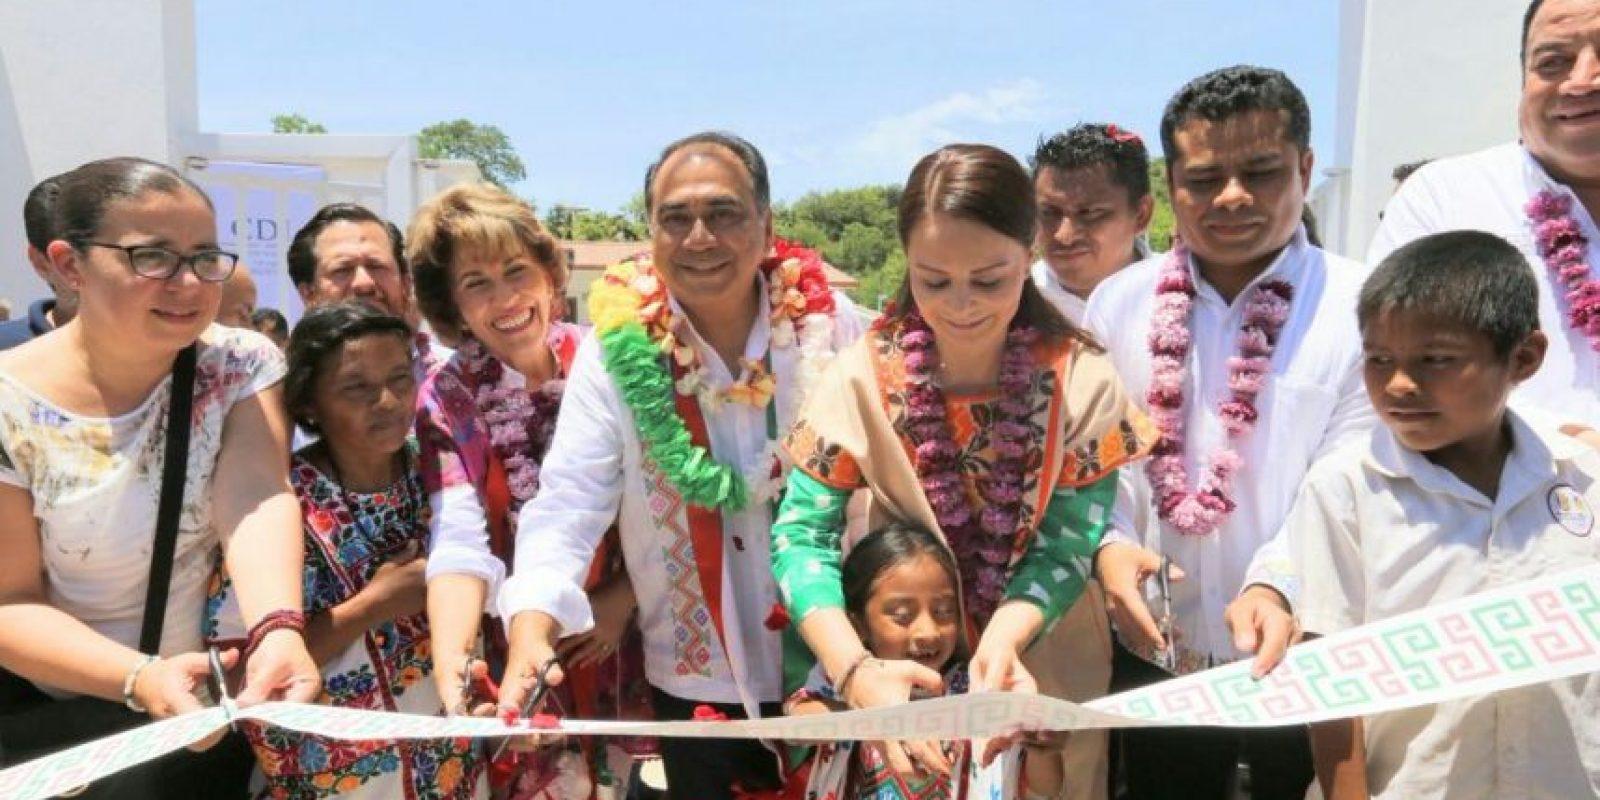 El gobernador cortó el listón de la casa Foto:Twitter @HectorAstudillo